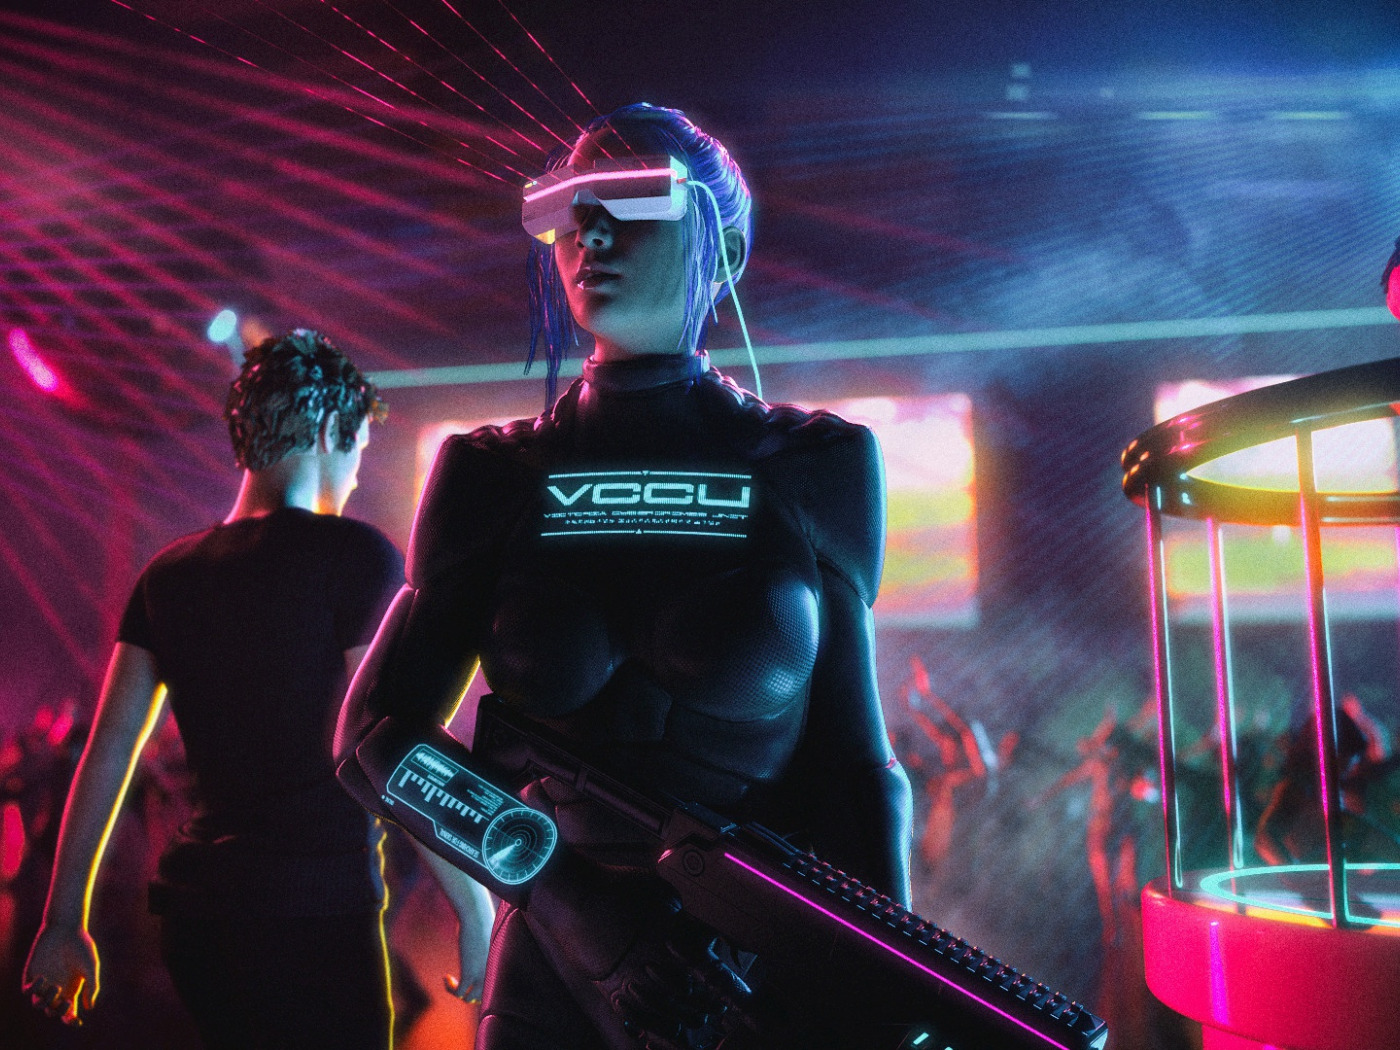 david-legnon-retro-synthwave-synth-retrowave-synthwave-fon-4.jpg - Cyberpunk 2077